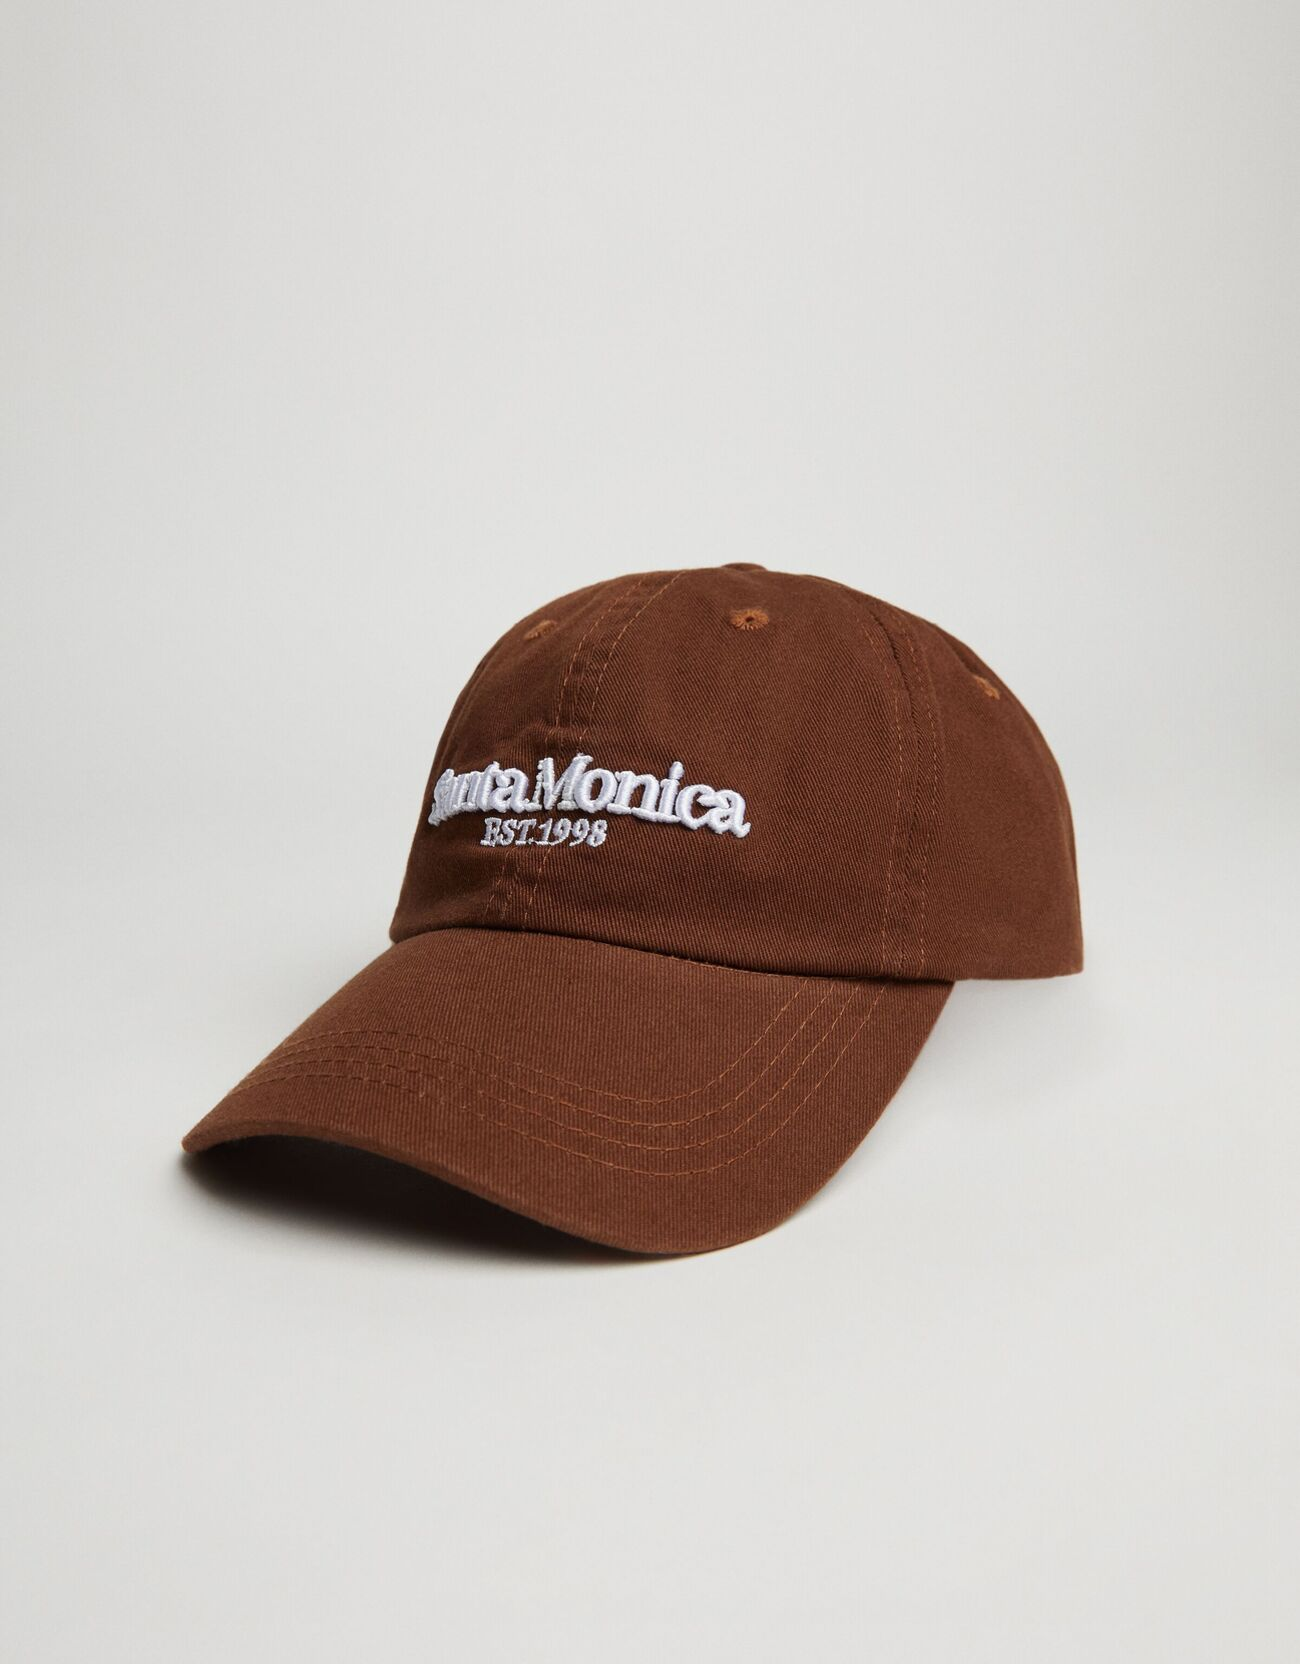 Bershka Retro Santa Monica Şapka Kadın Kahverengi